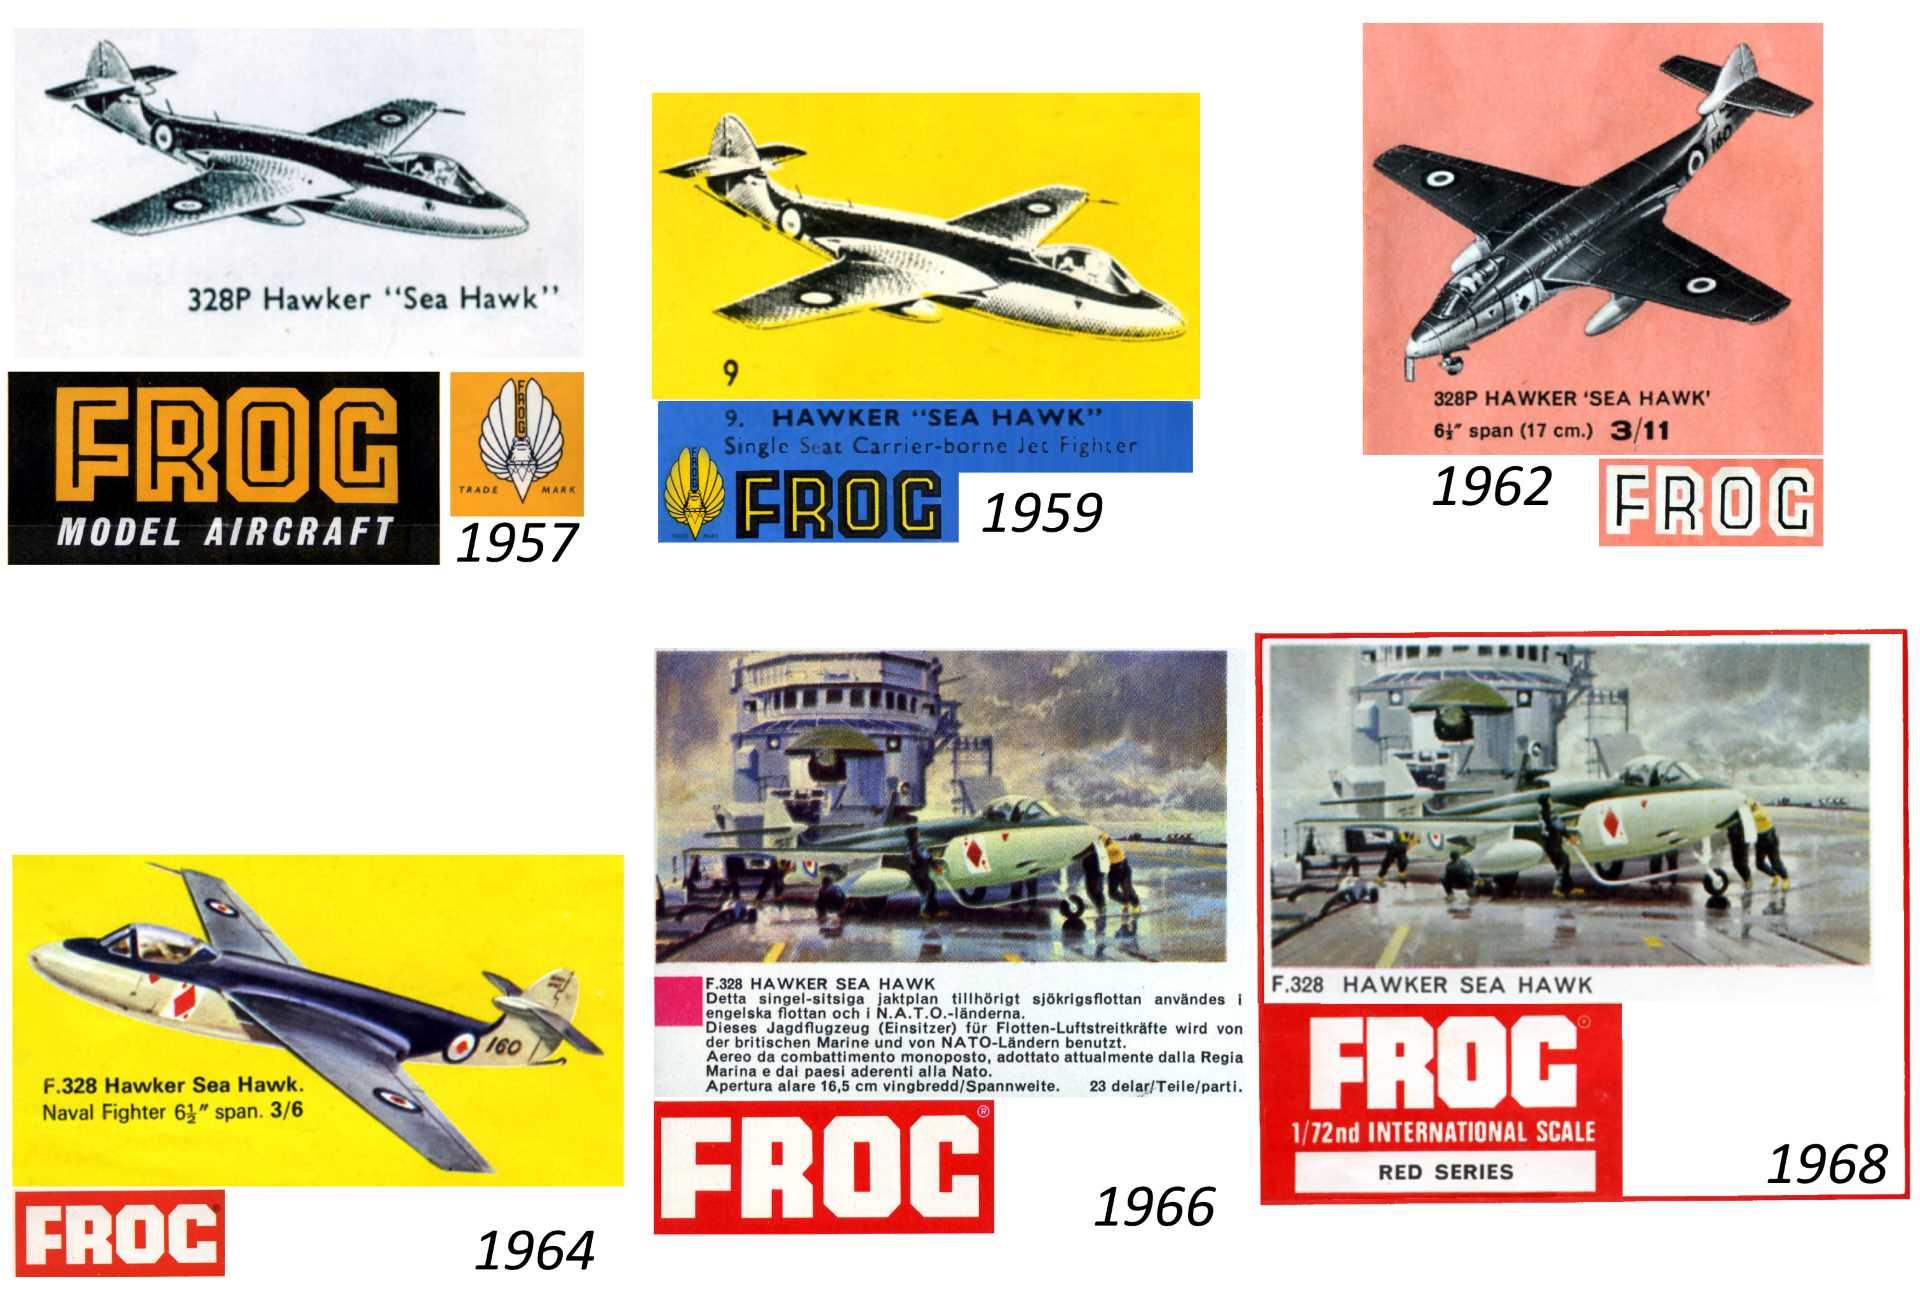 328P Hawker Sea Hawk в каталогах FROG 1957-1969